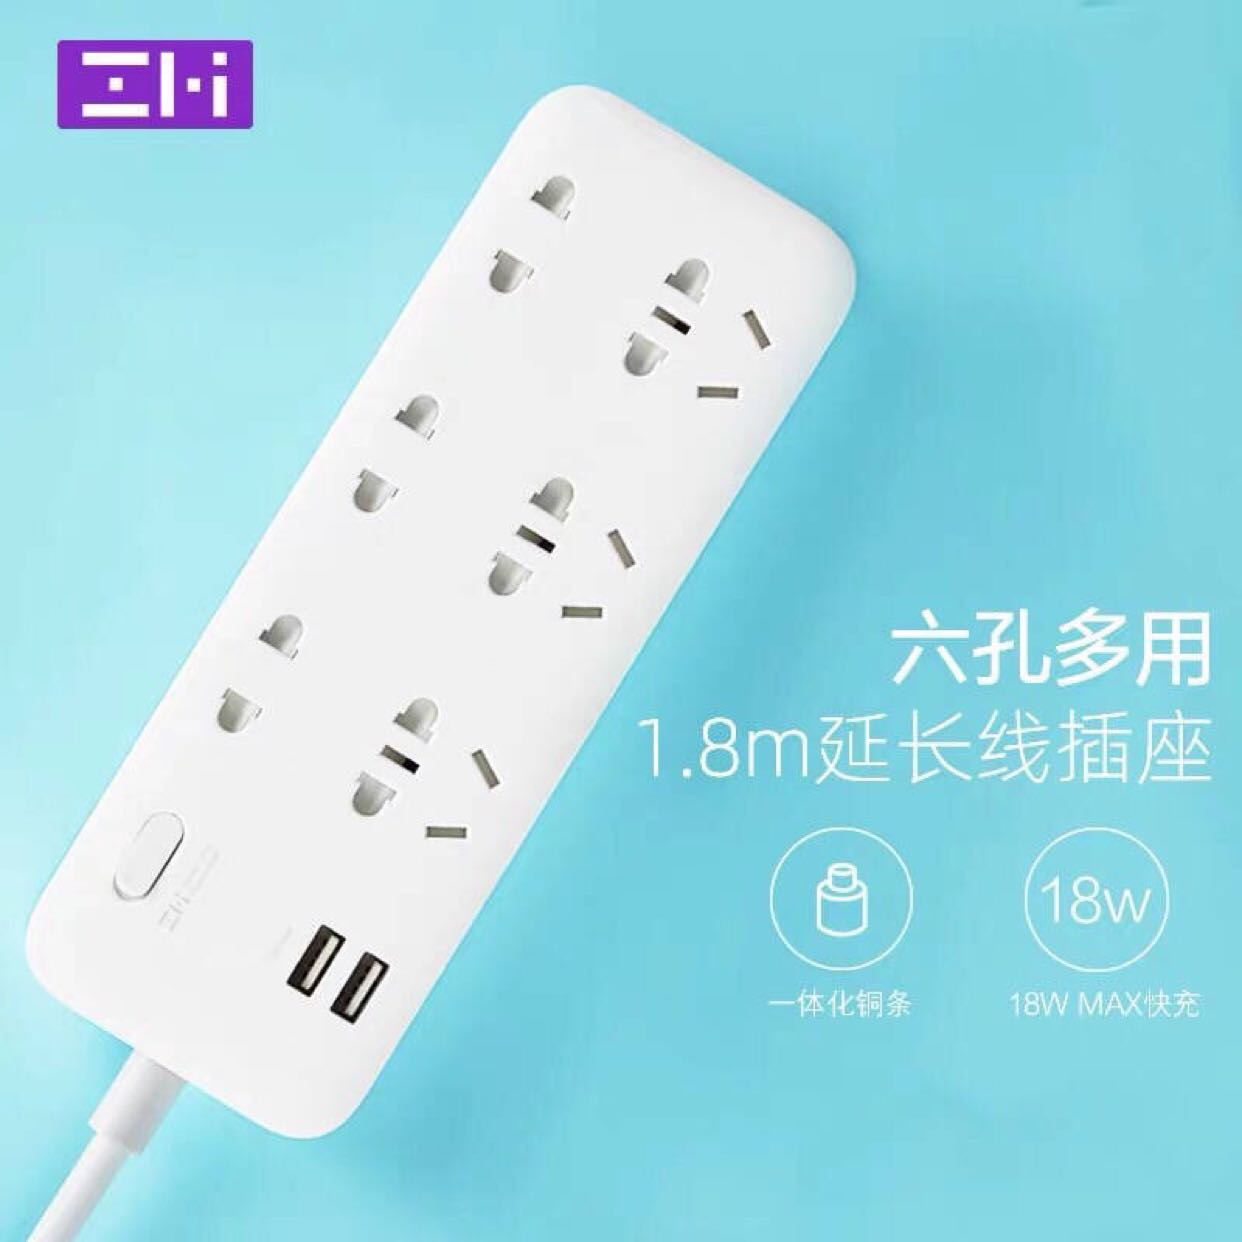 ZMI紫米插座双USB口快充18W插排学生宿舍办公室家用多功能接线板